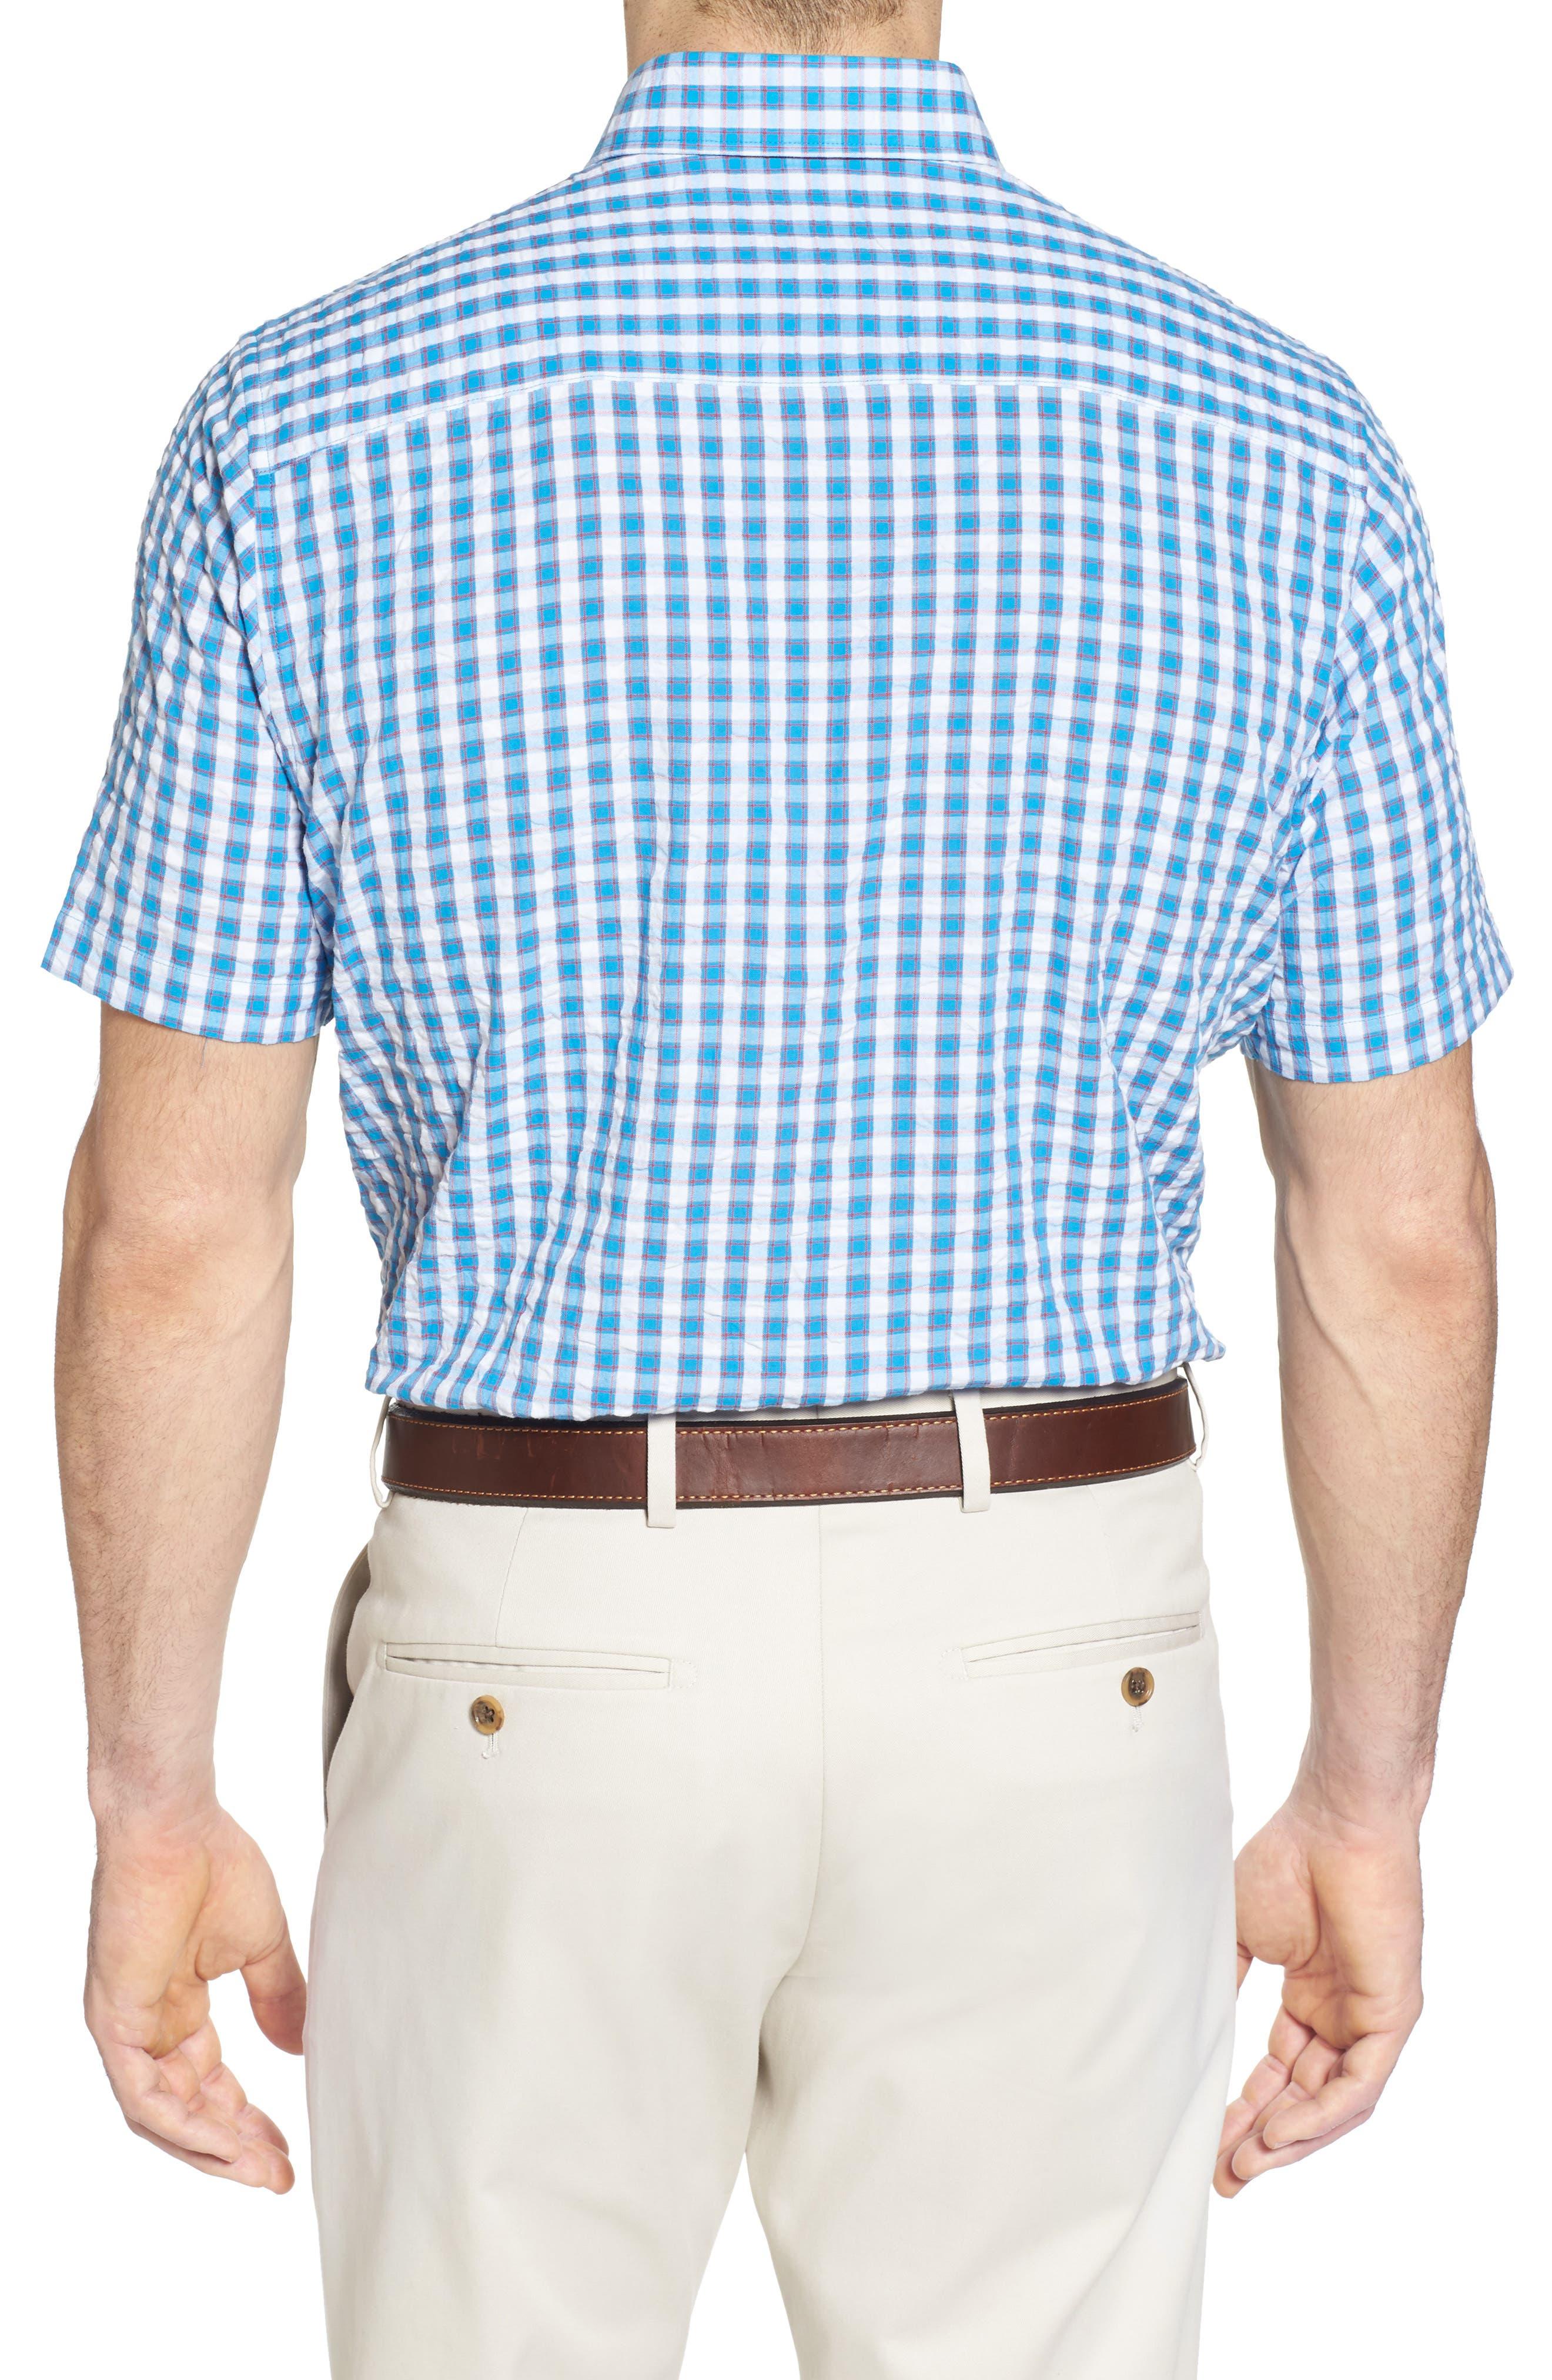 Tyler Classic Fit Seersucker Sport Shirt,                             Alternate thumbnail 2, color,                             Poolside